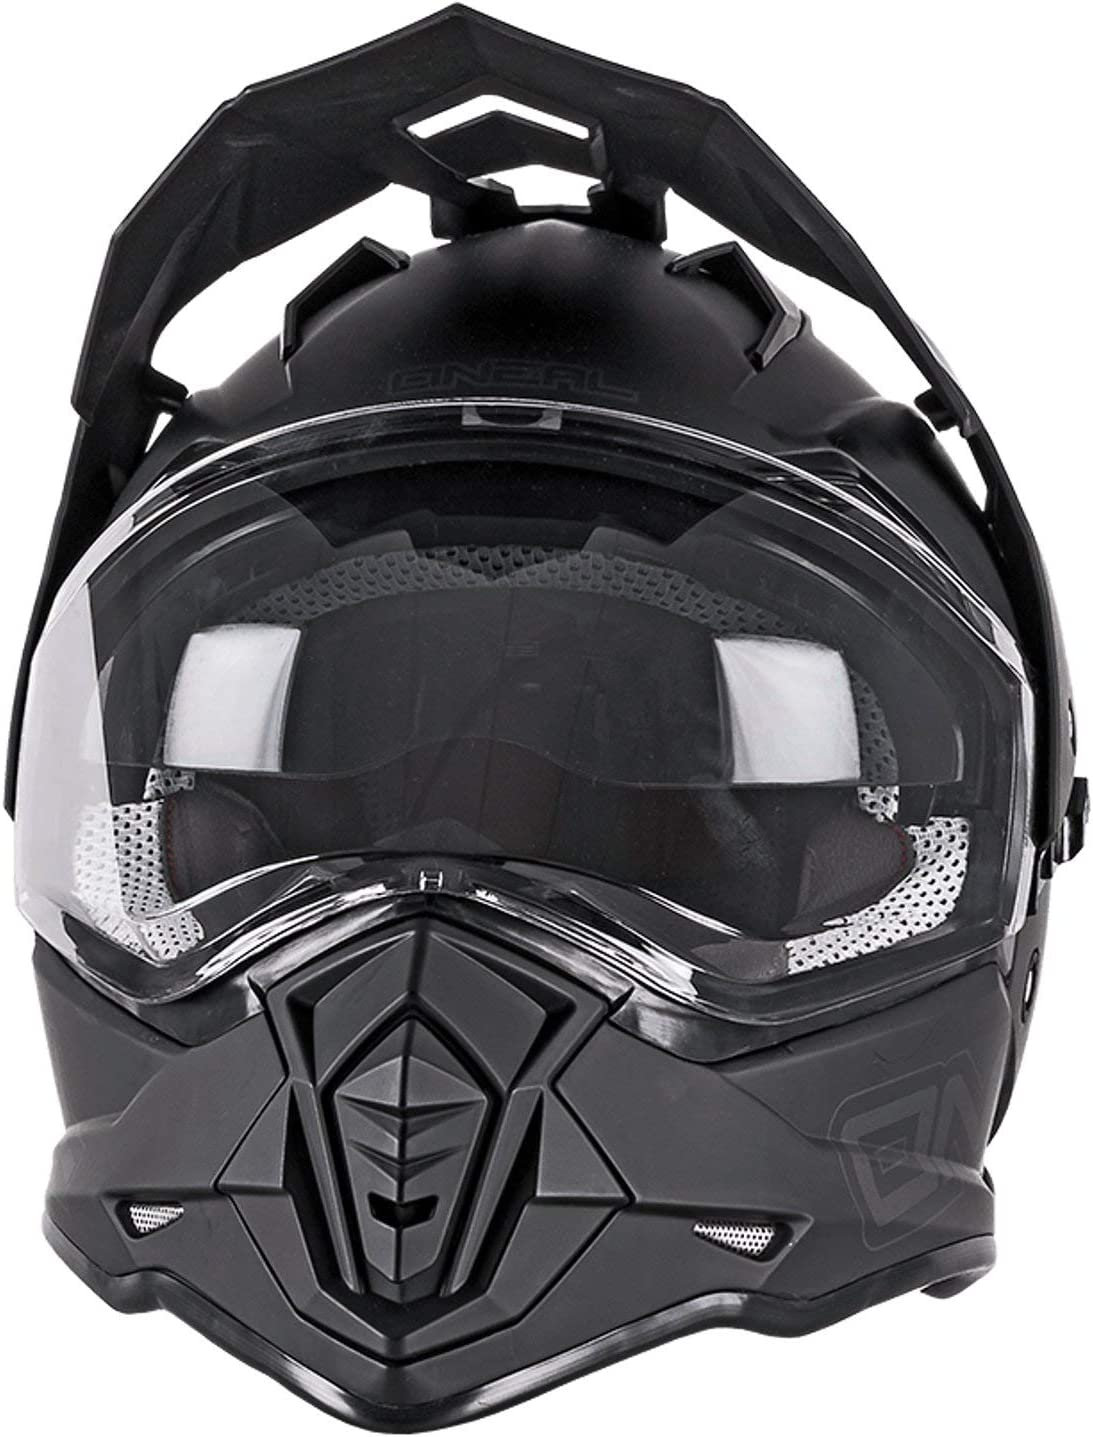 ONeal Sierra II Helmet COMB black//white S 55//56cm